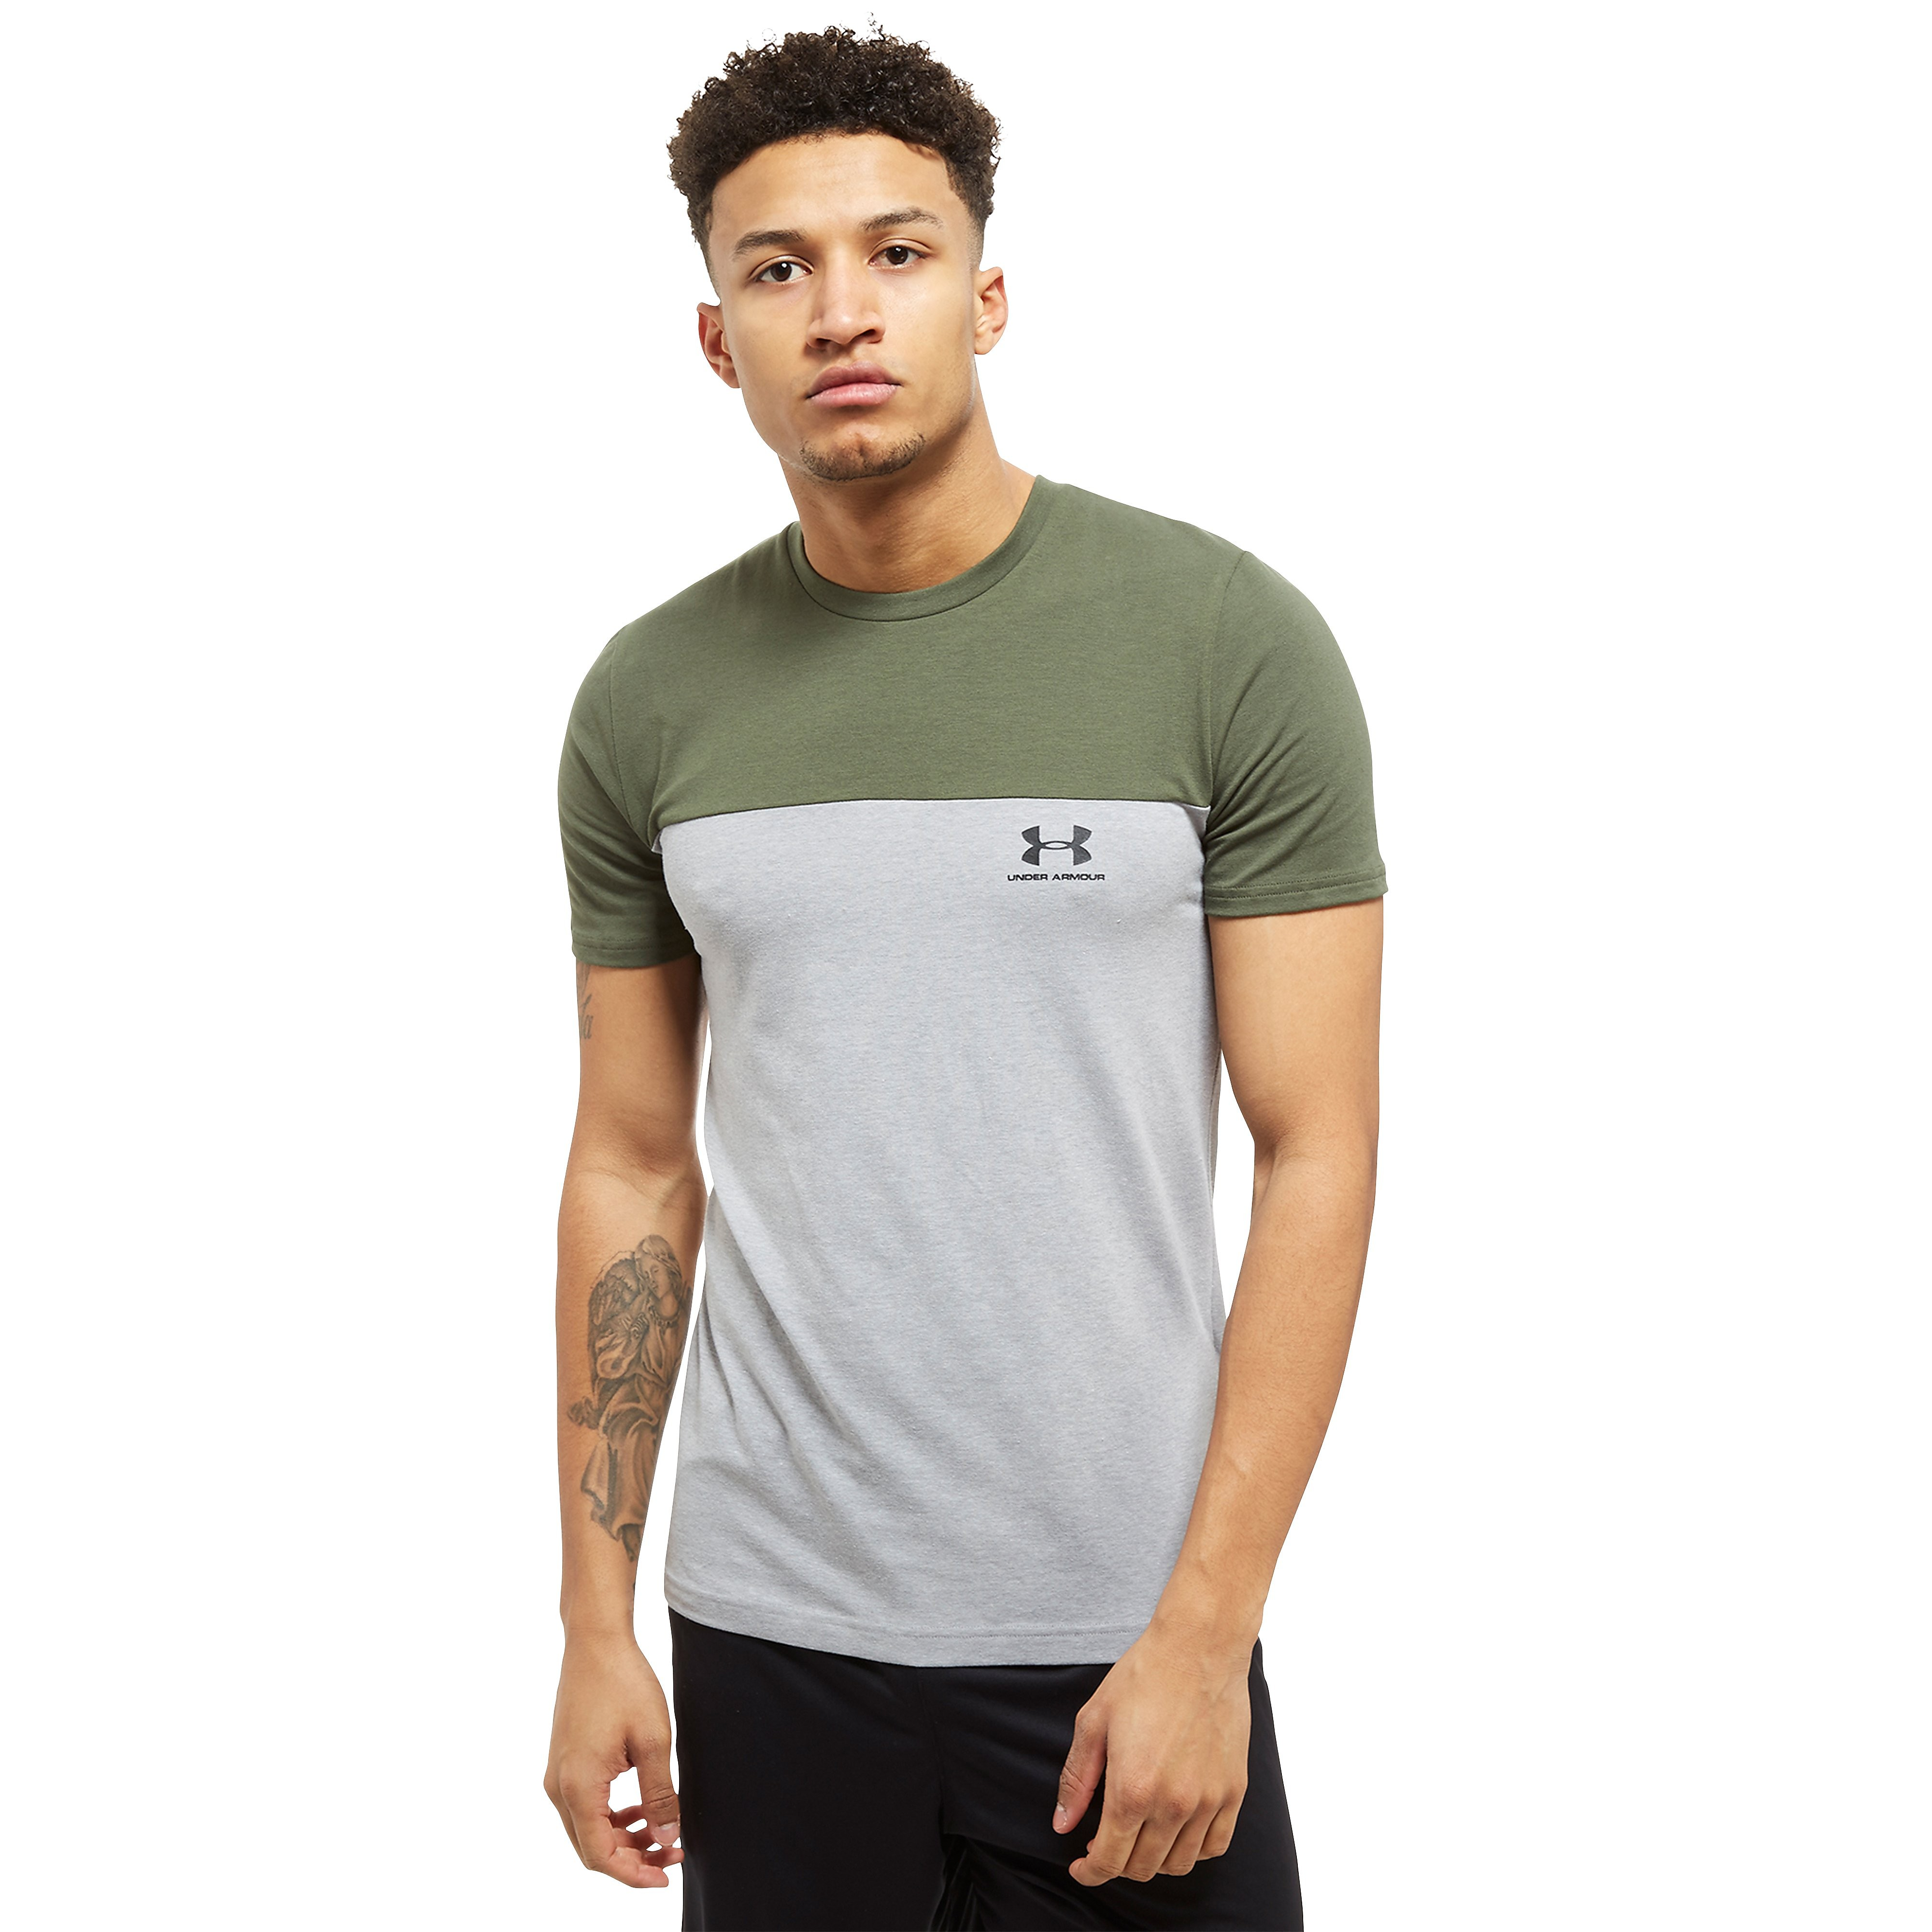 Under Armour Coldblack Men's Training T-shirt